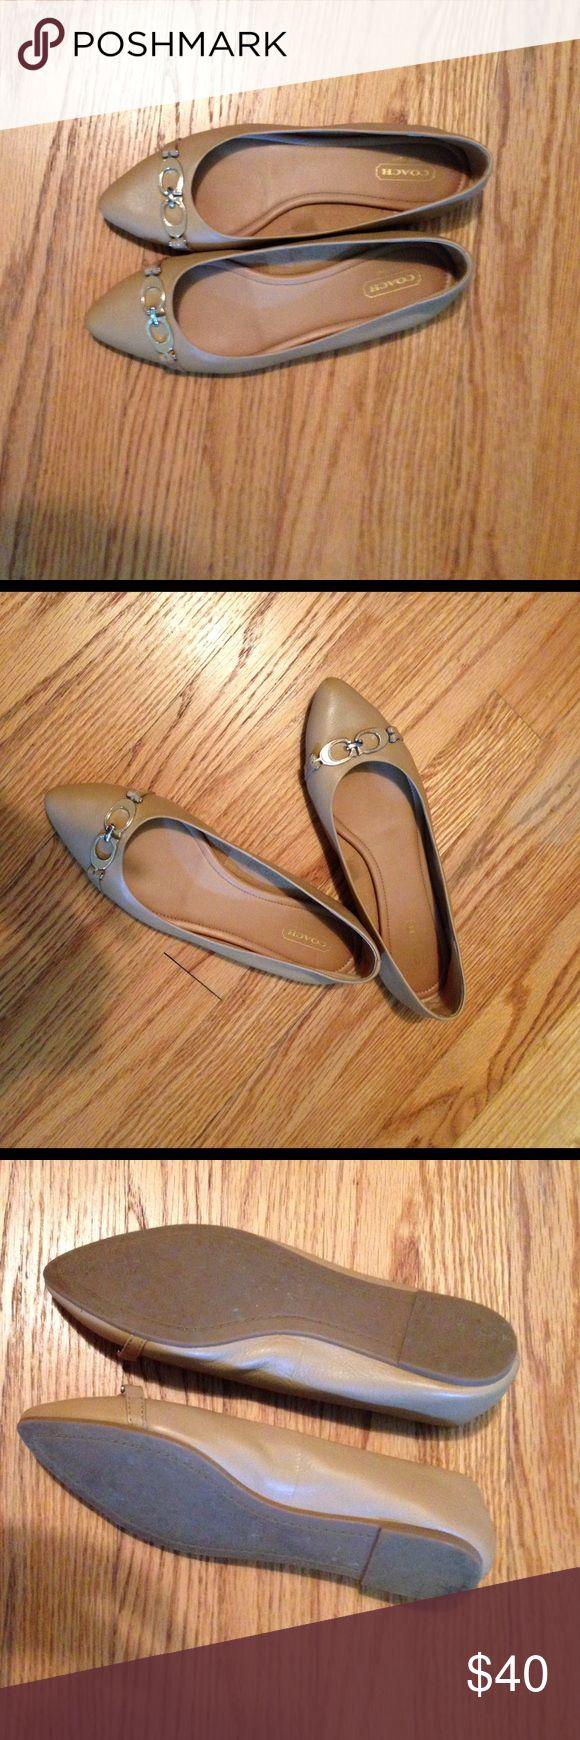 Coach flats - 7.5 Coach flats - 7.5 Coach Shoes Flats & Loafers